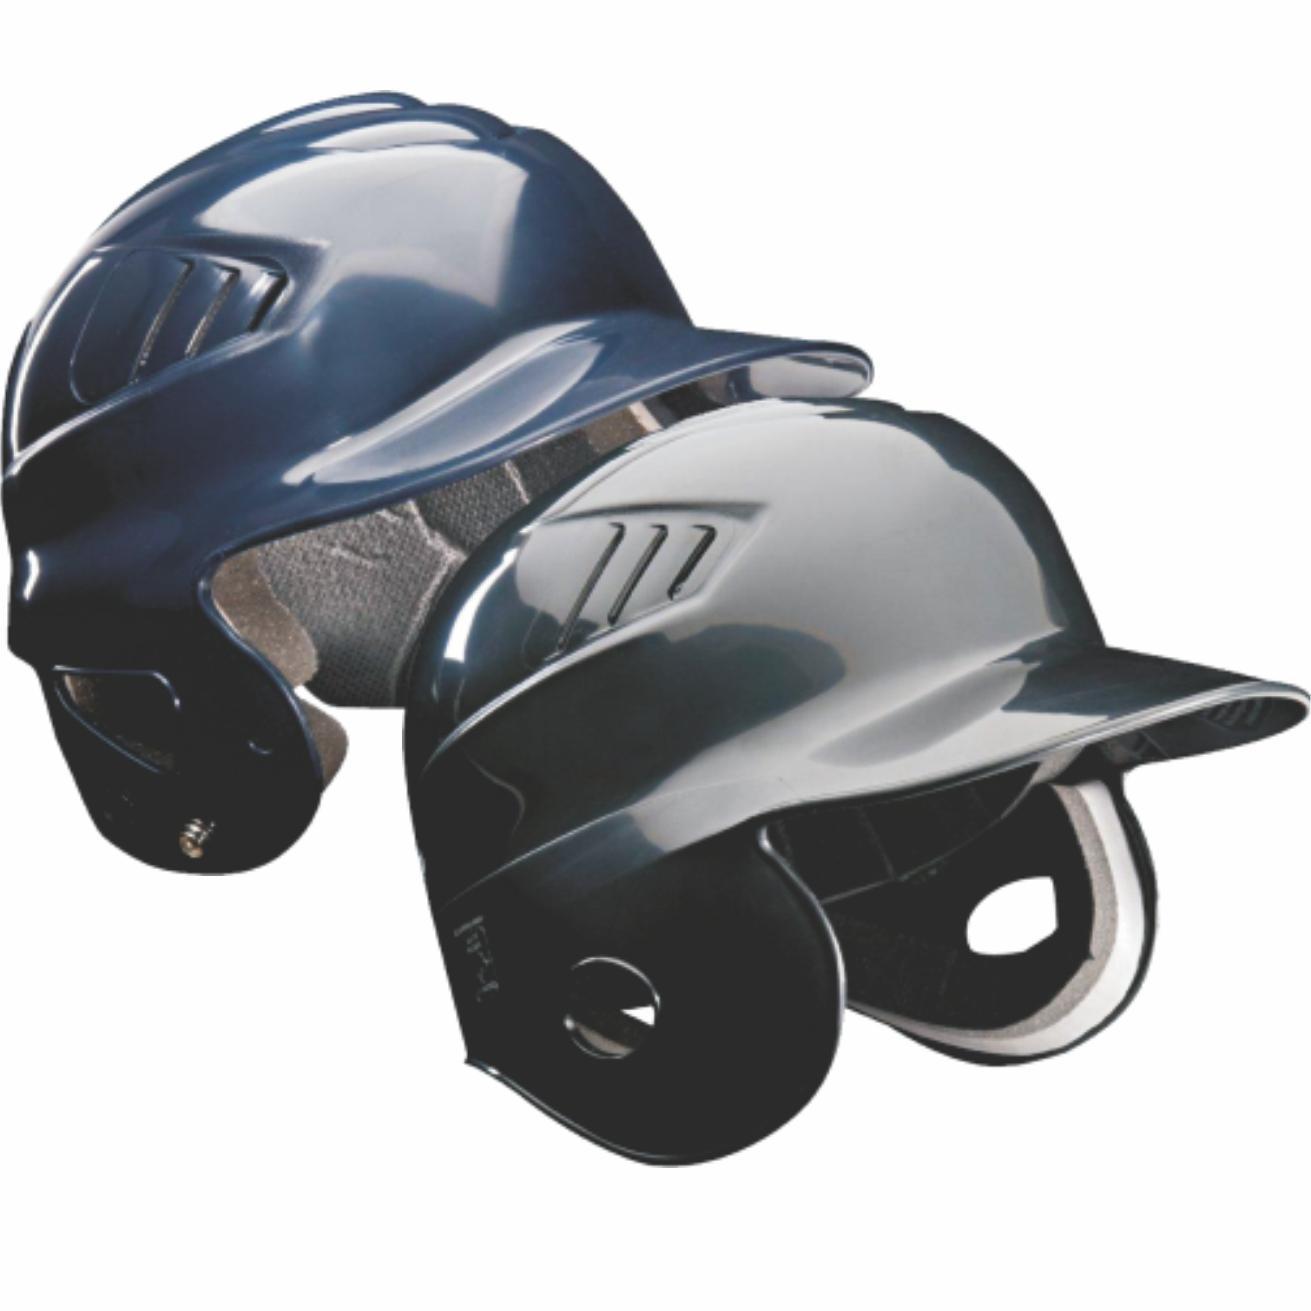 Batting Helmets